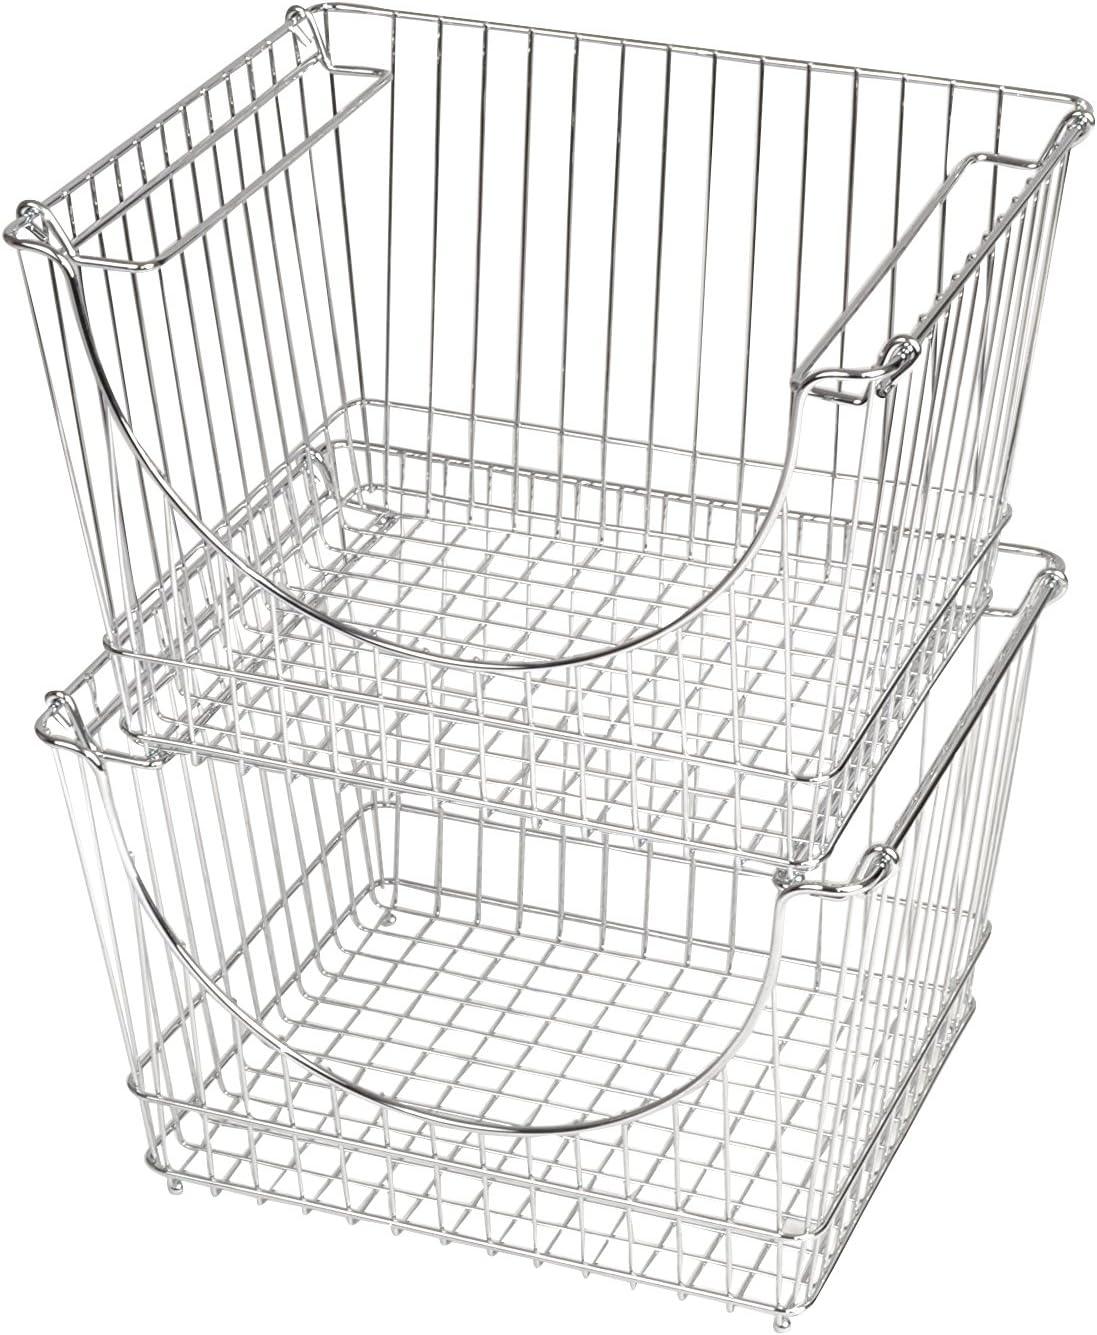 Smart Design Stacking Basket Bin Pantry Freezer Storage Organizer - Large (12.63 x 8.5 Inch) - Steel Metal Wire - Fruit, Vegetable, Onion, Potato, Cans - Kitchen [Chrome] - Set of 2